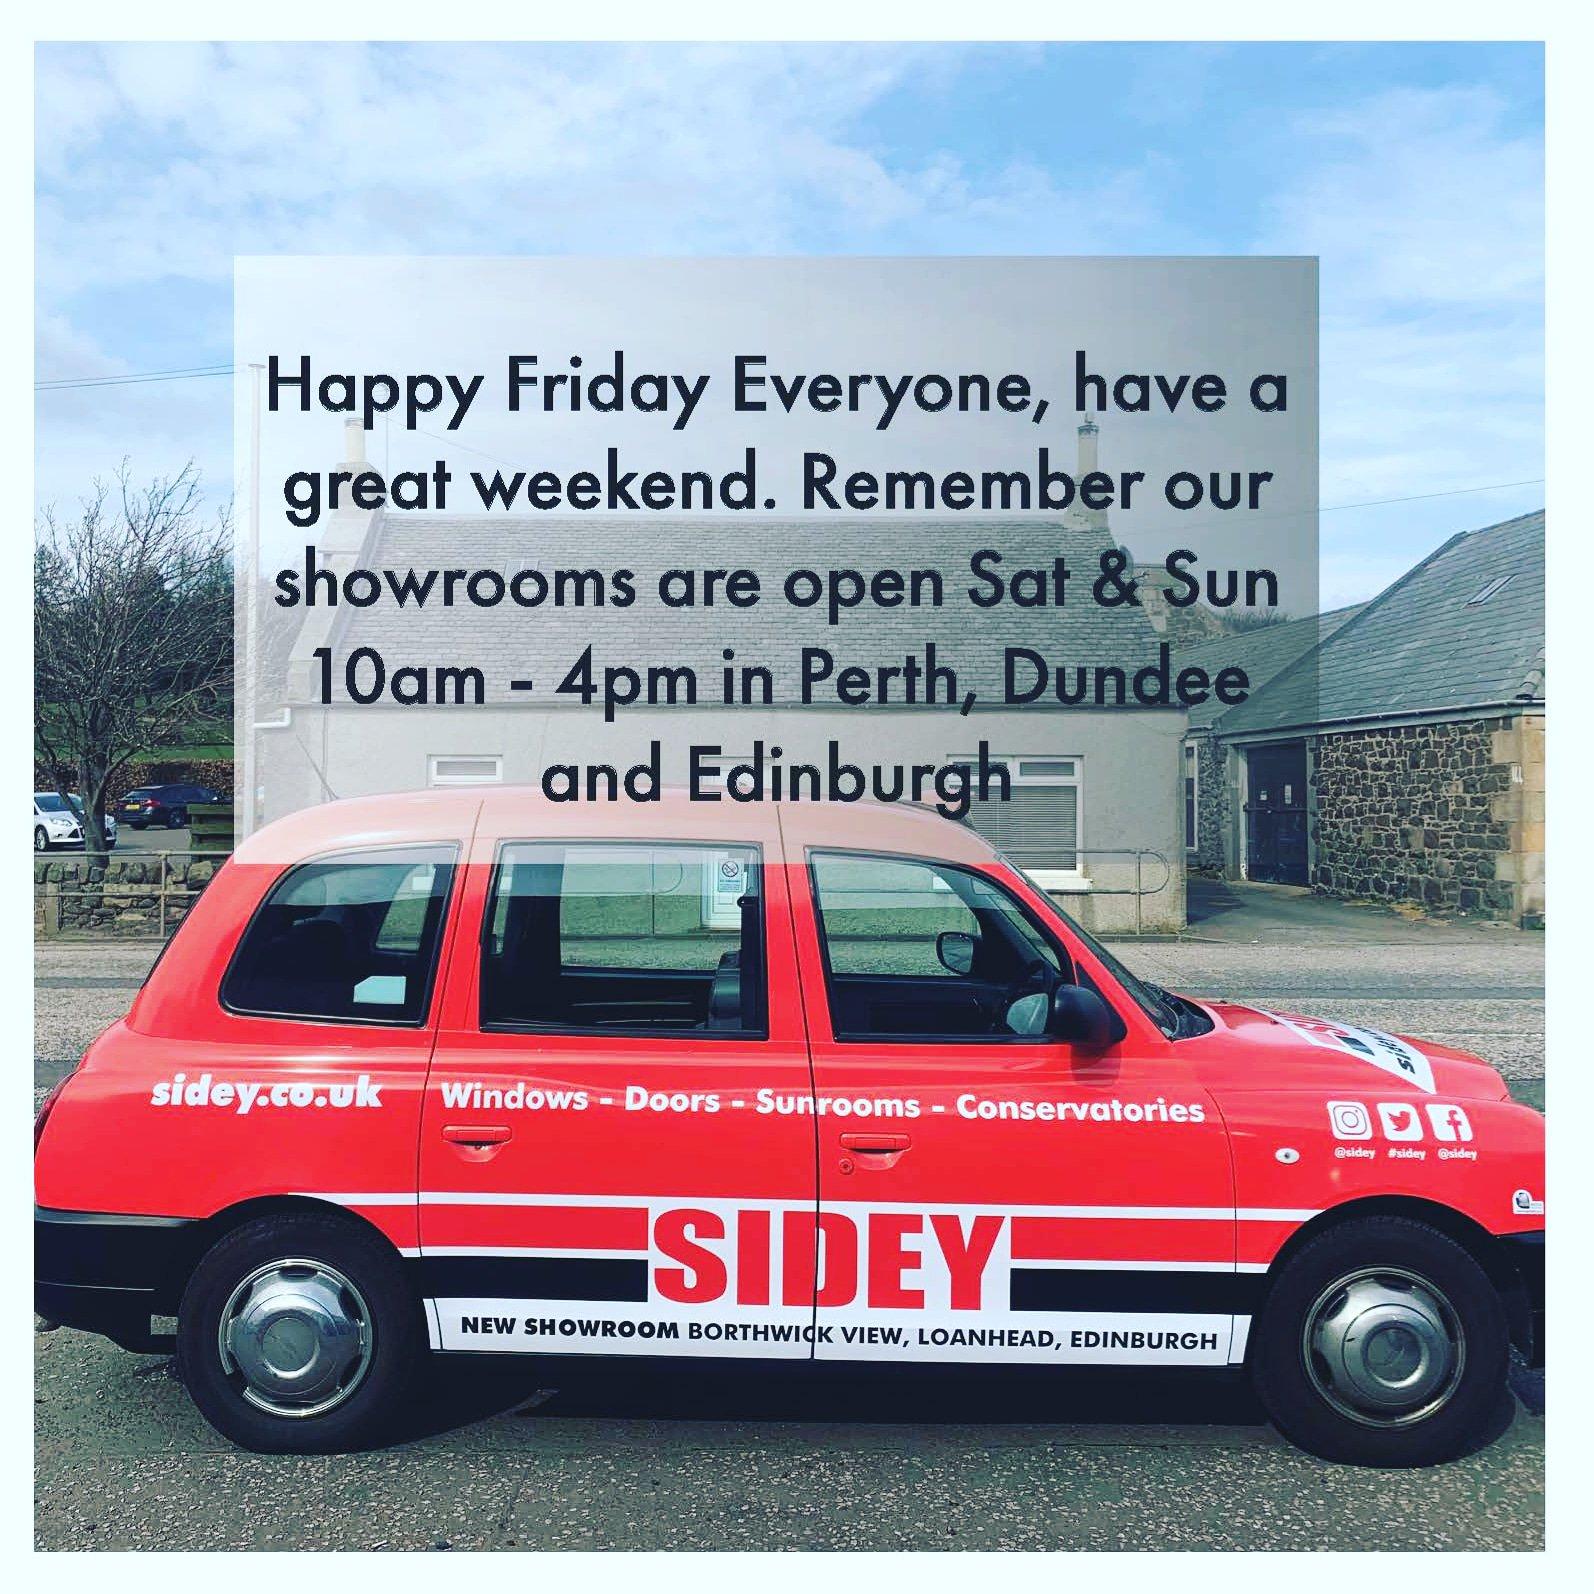 Happy Friday ???????? #sidey #sideyshowrooms #fridayfeeling #sideywindows #sideydoors #sideytaxi ???? https://t.co/bVIG5Xke21